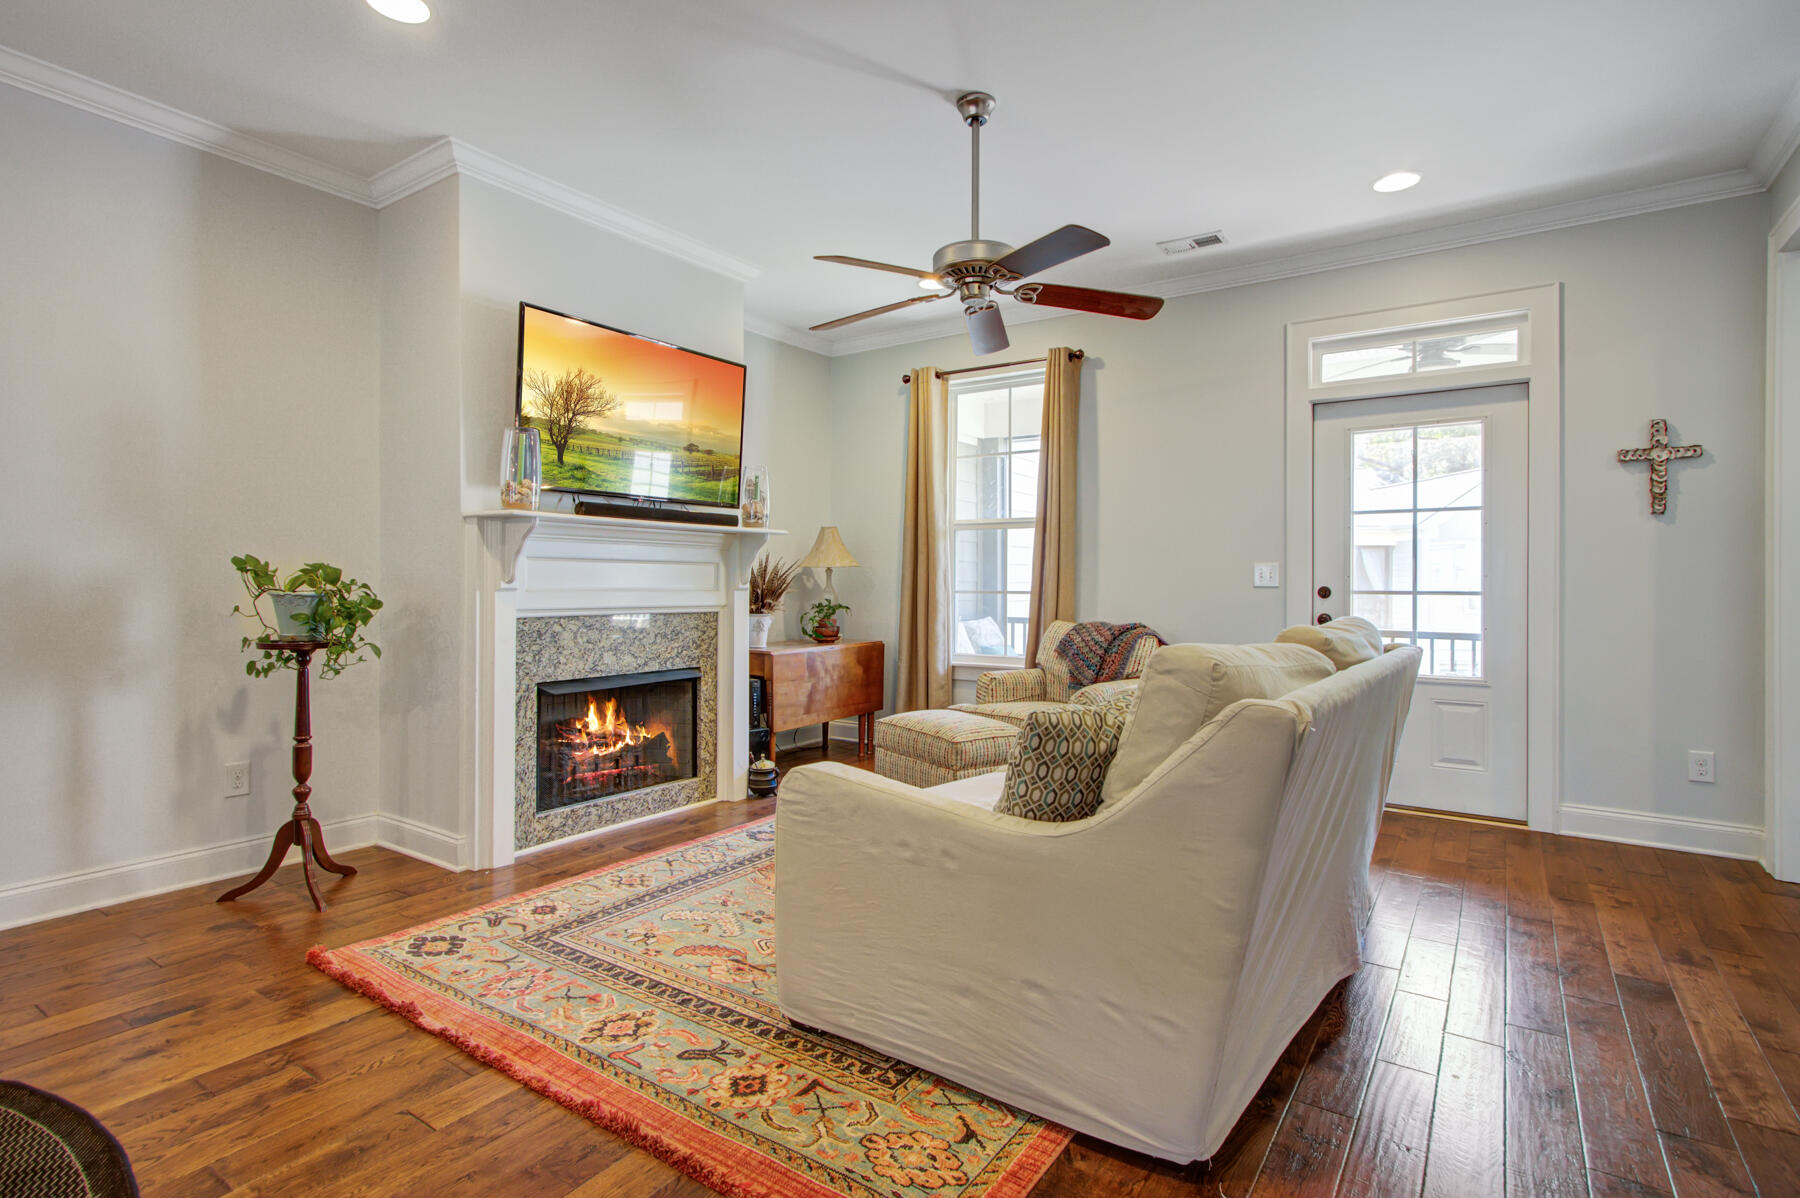 Etiwan Pointe Homes For Sale - 254 Slipper Shell, Mount Pleasant, SC - 10